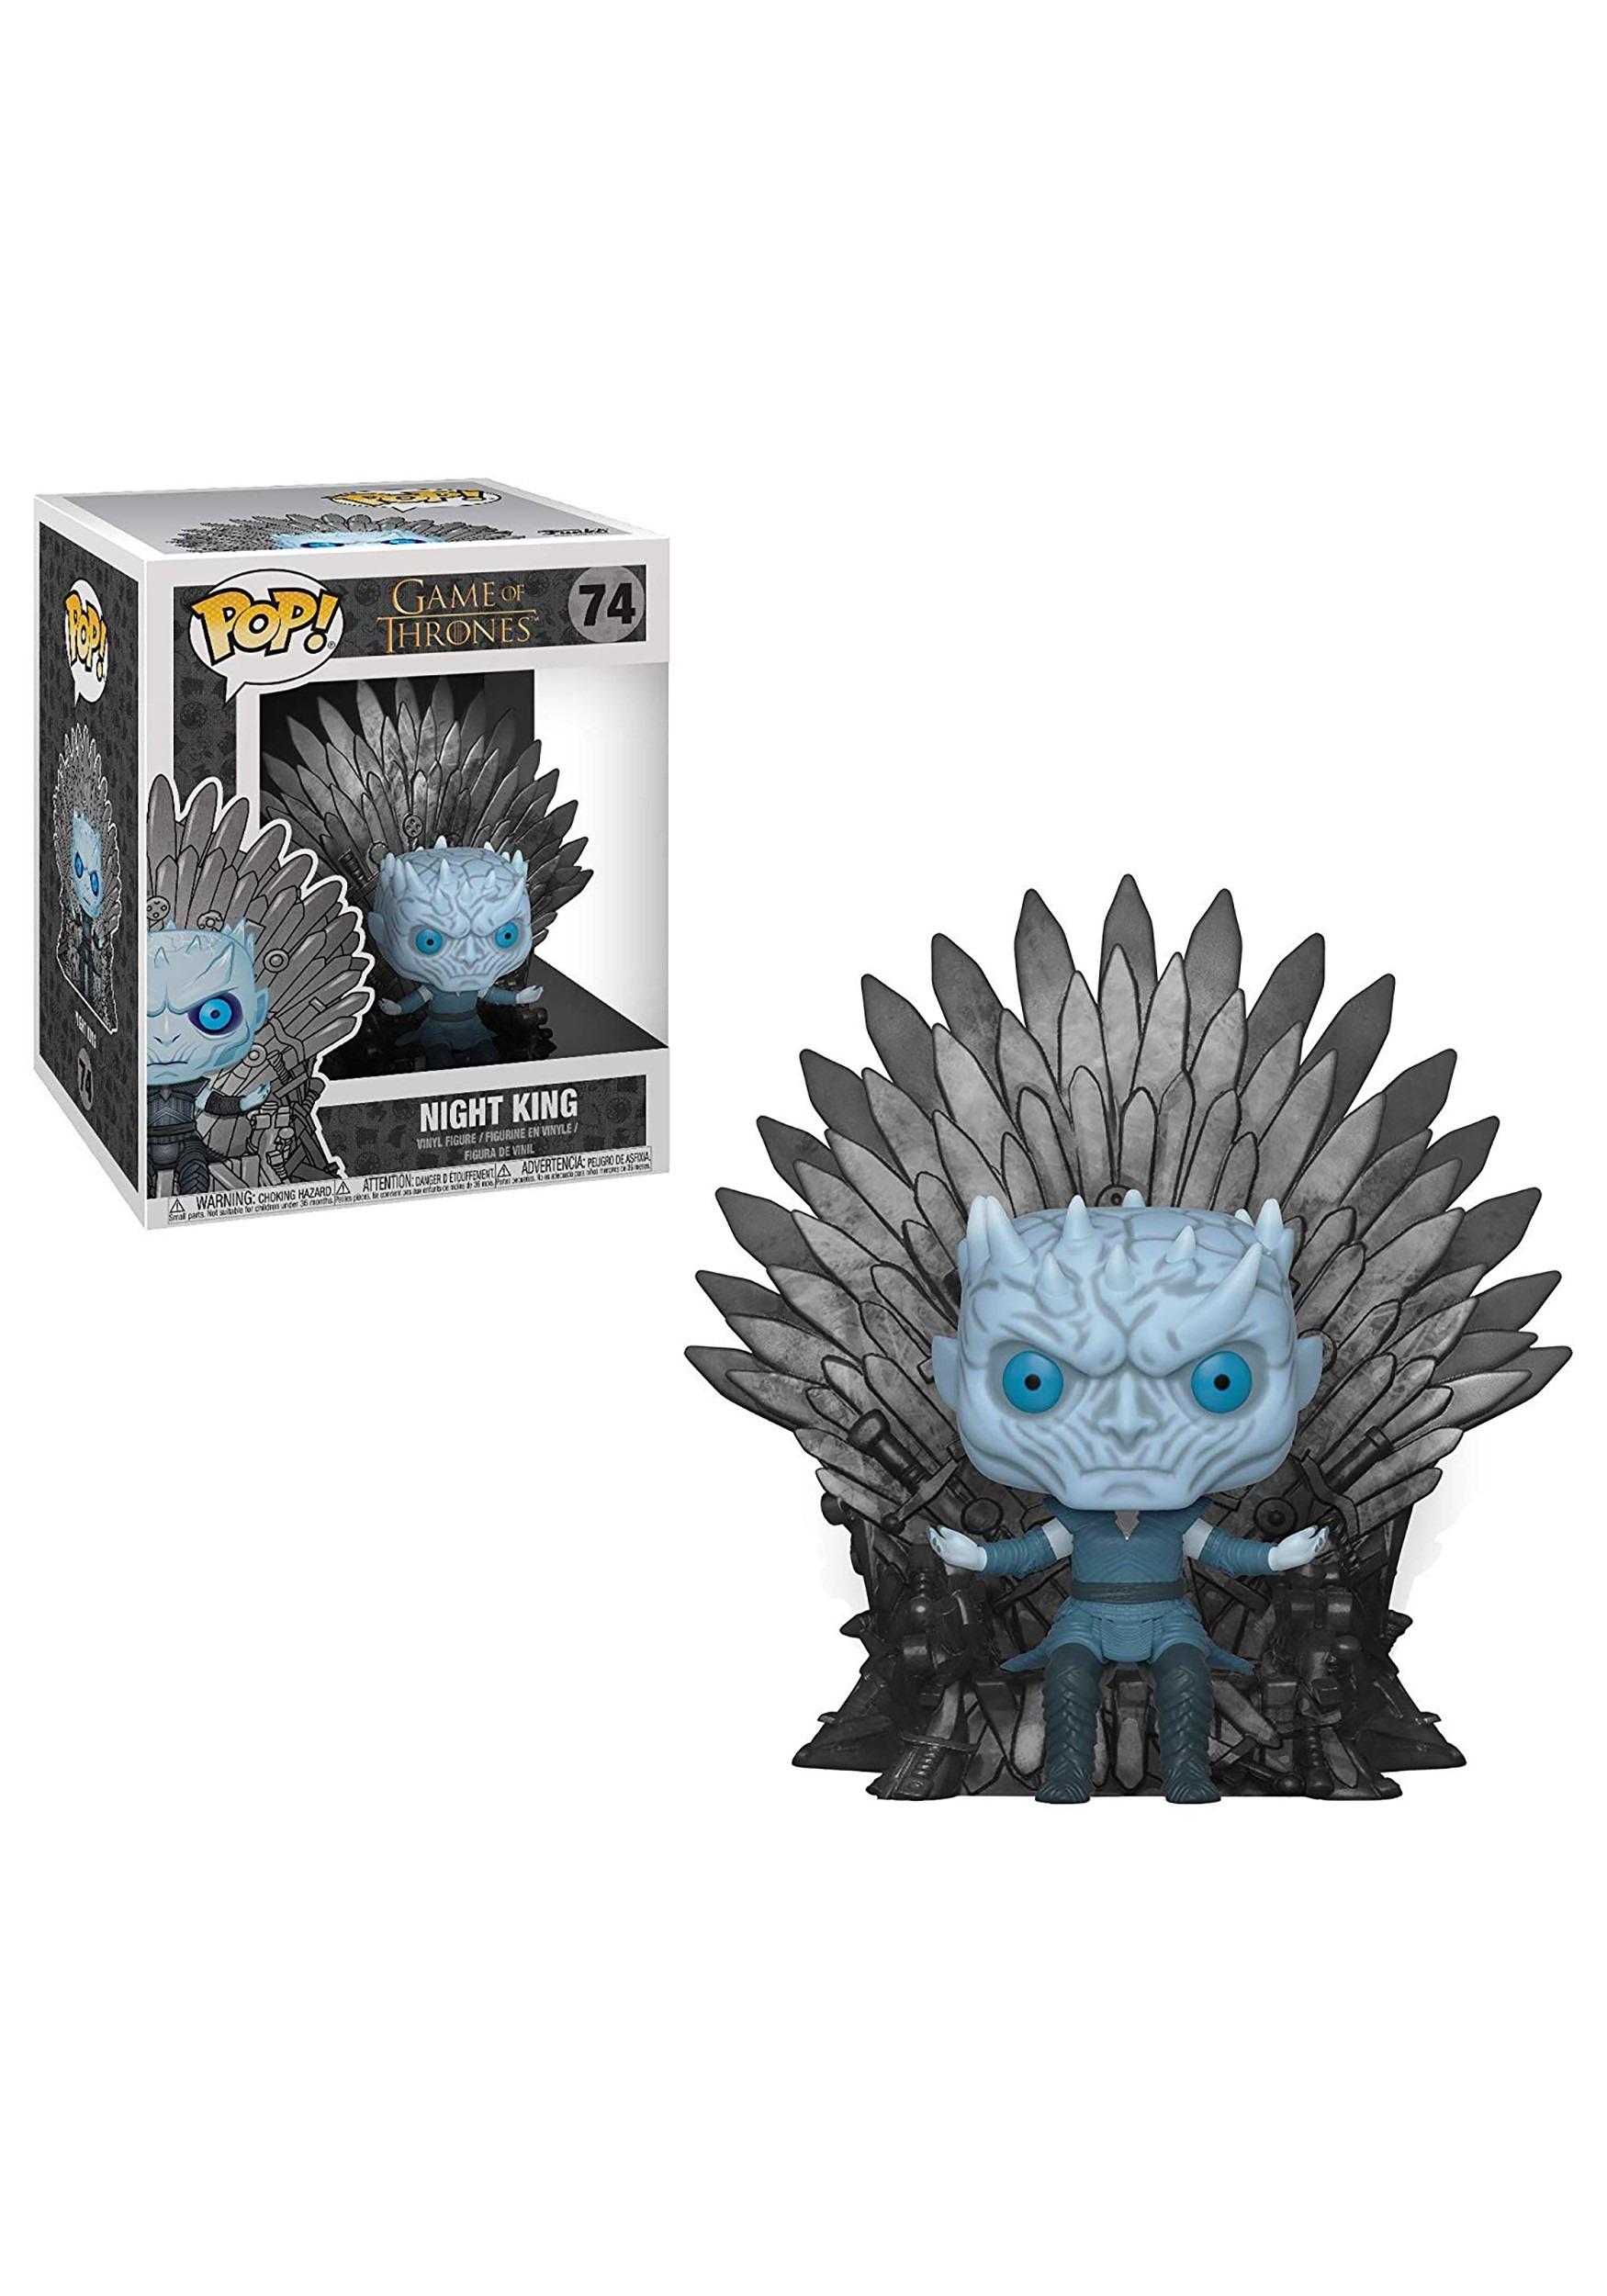 Night King on Iron Throne Deluxe Pop Vinyl Figure Game of Thrones